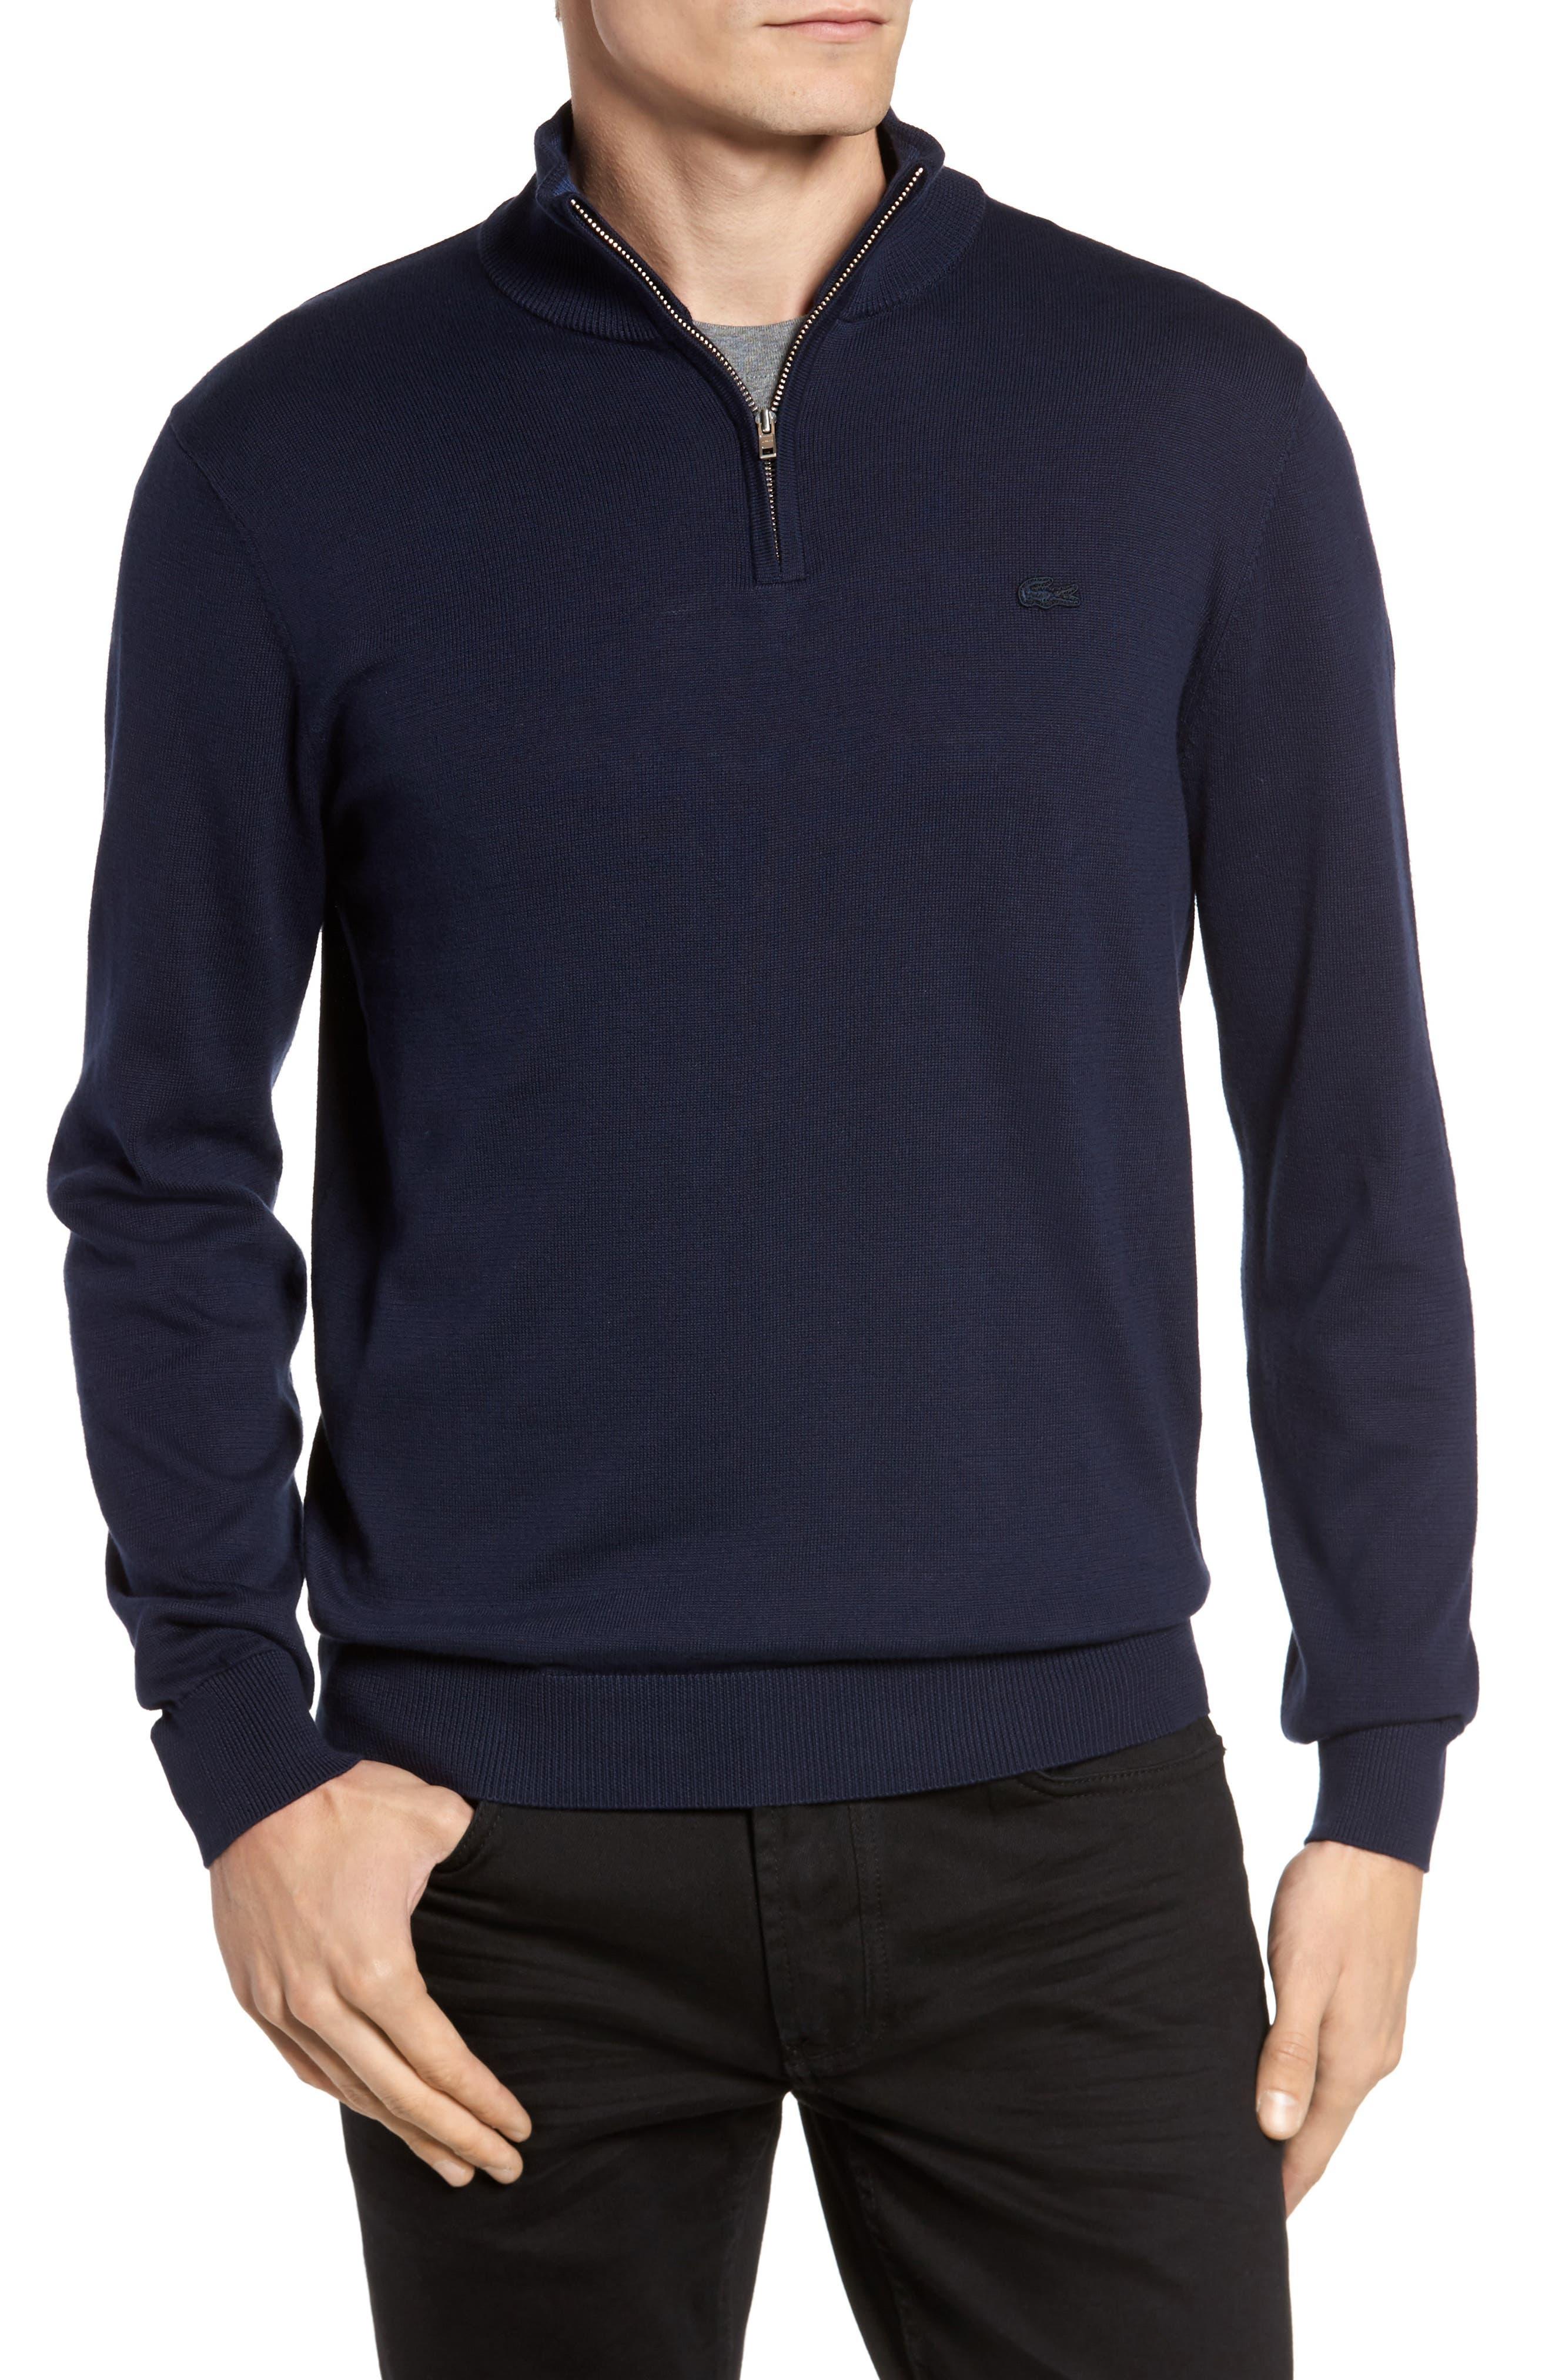 Main Image - Lacoste Quarter Zip Sweater